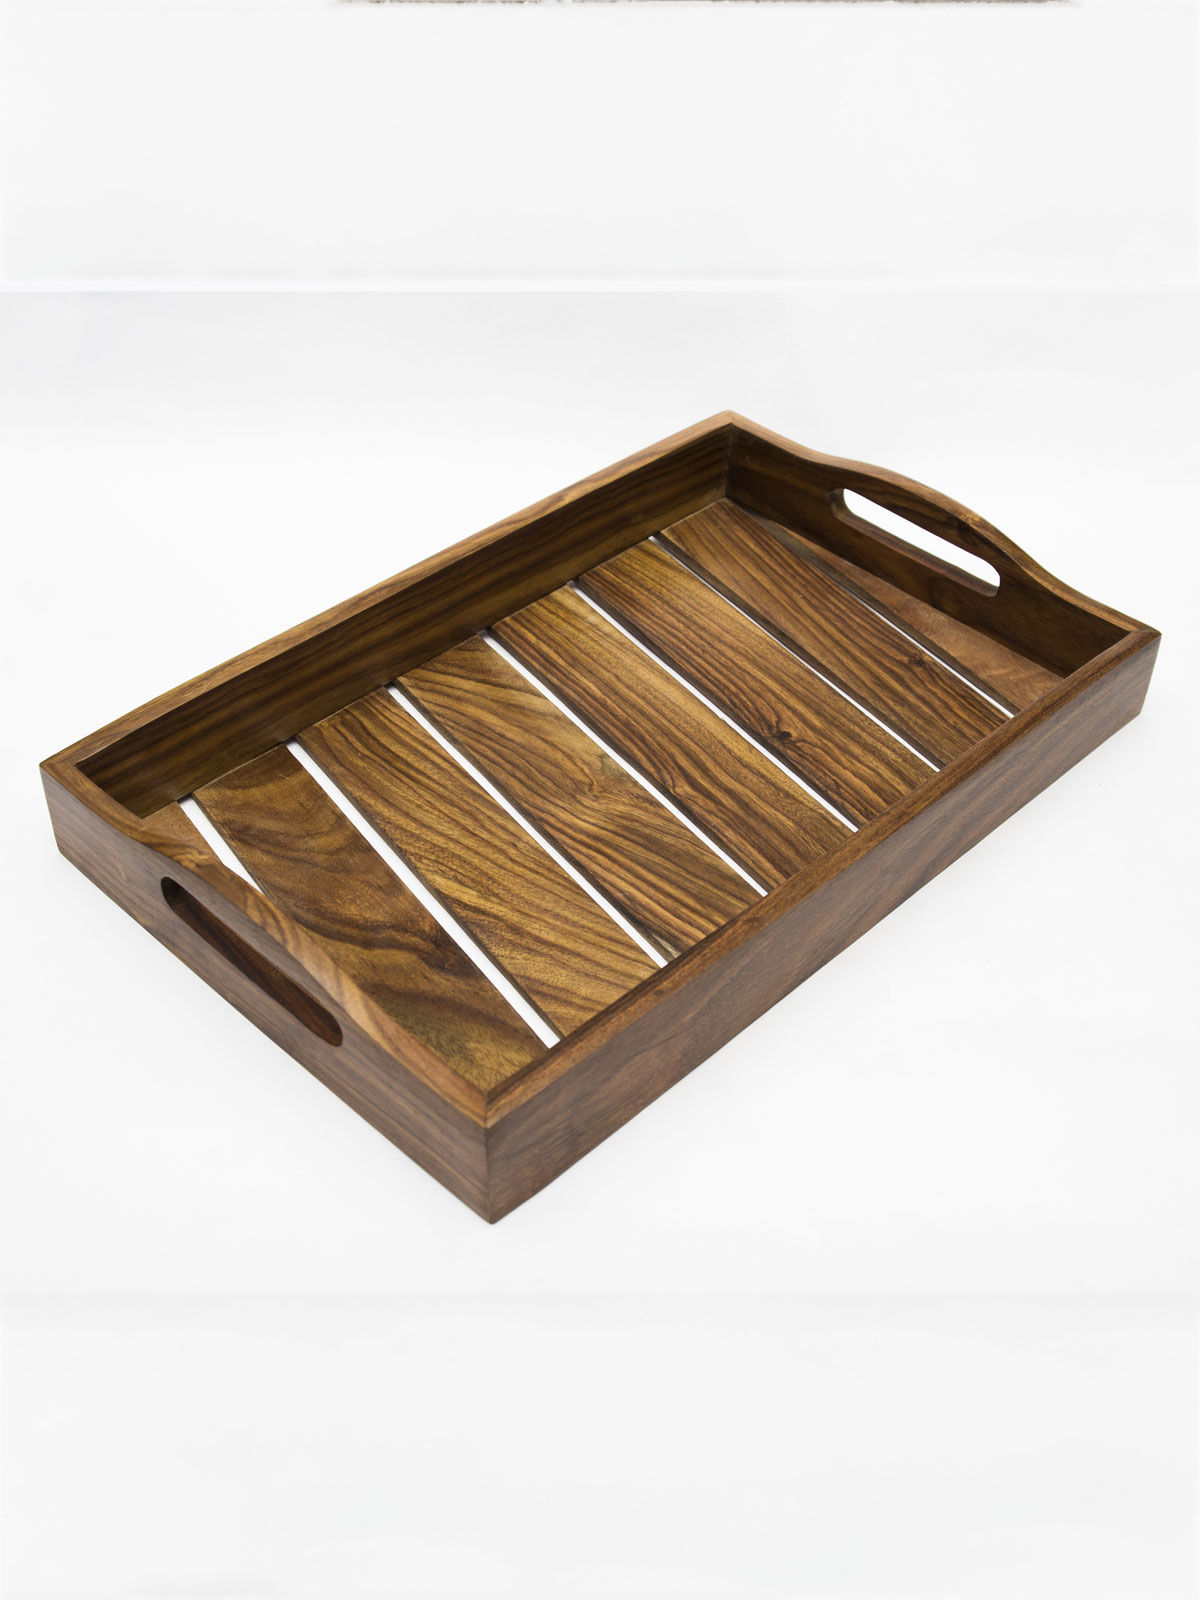 Slatted tray